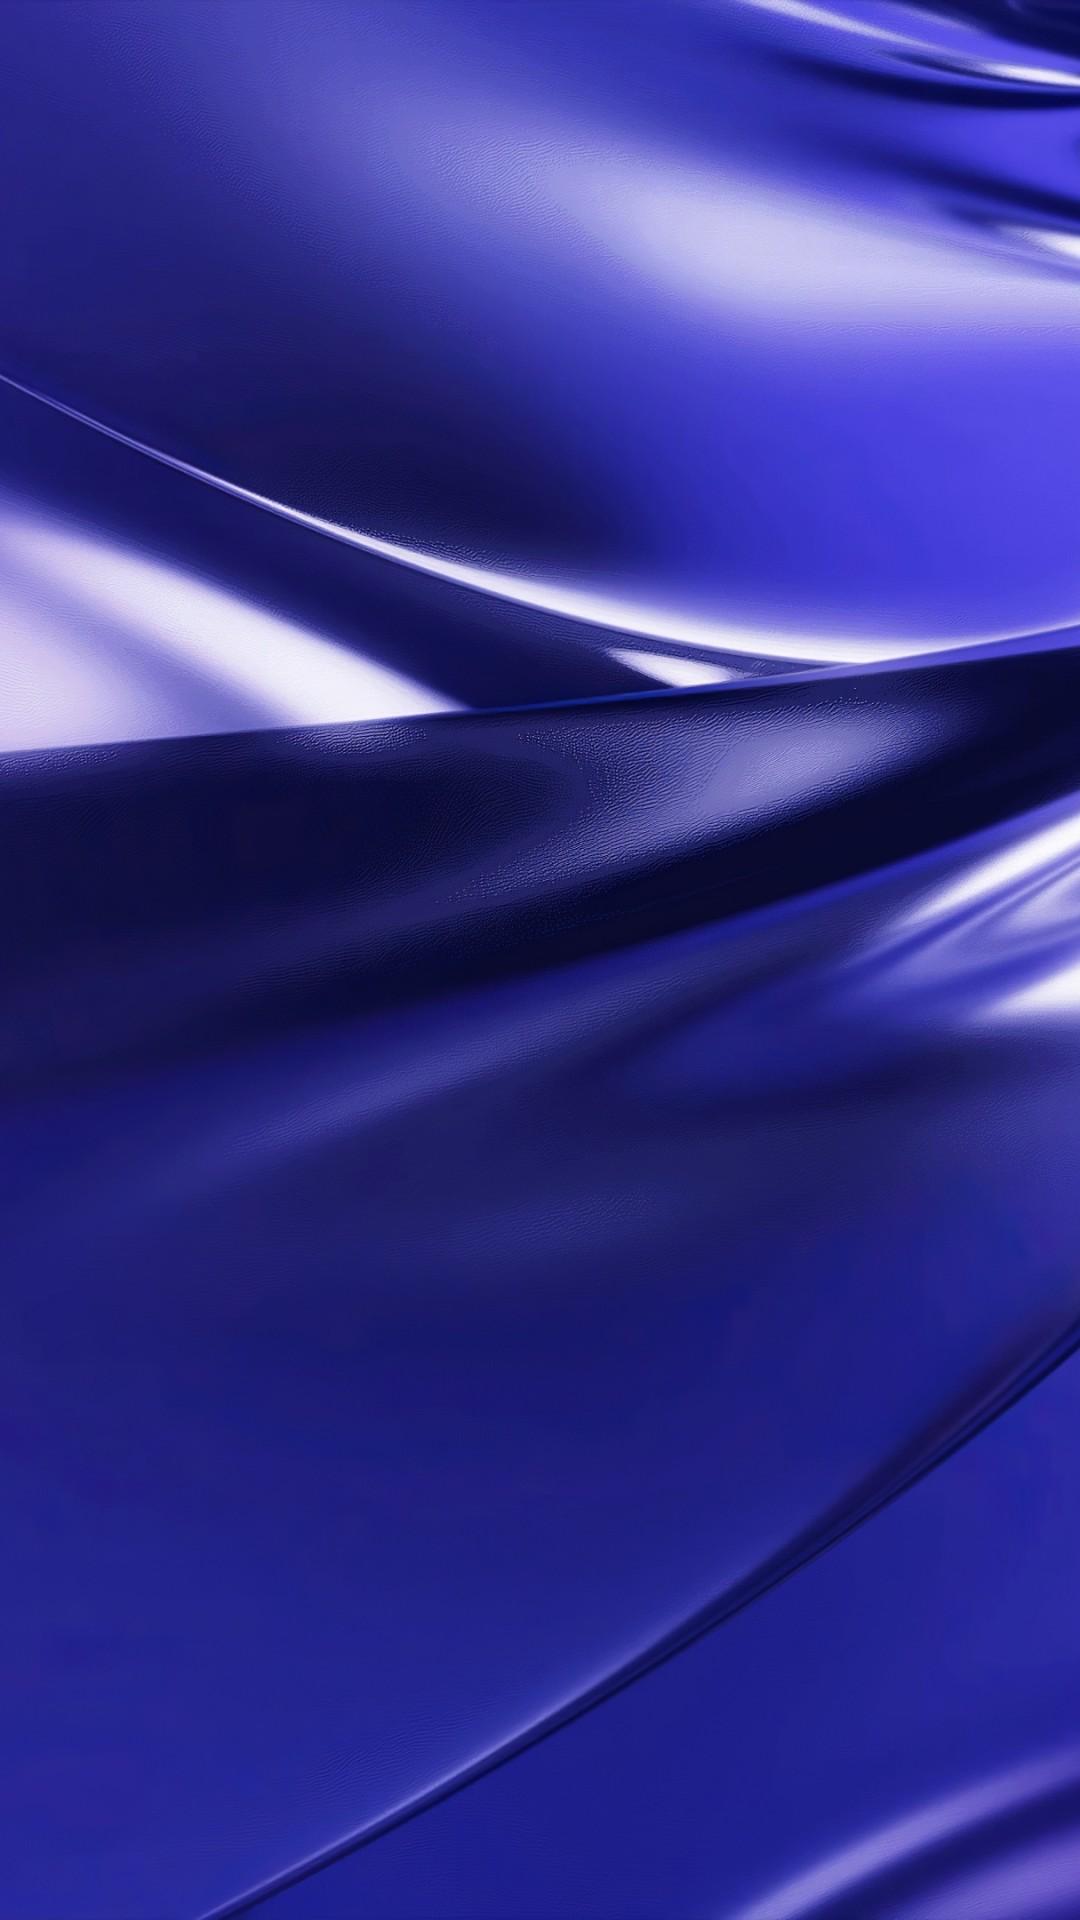 Wallpaper Vivo Nex 3, colorful, Android 10, abstract, 4K ...